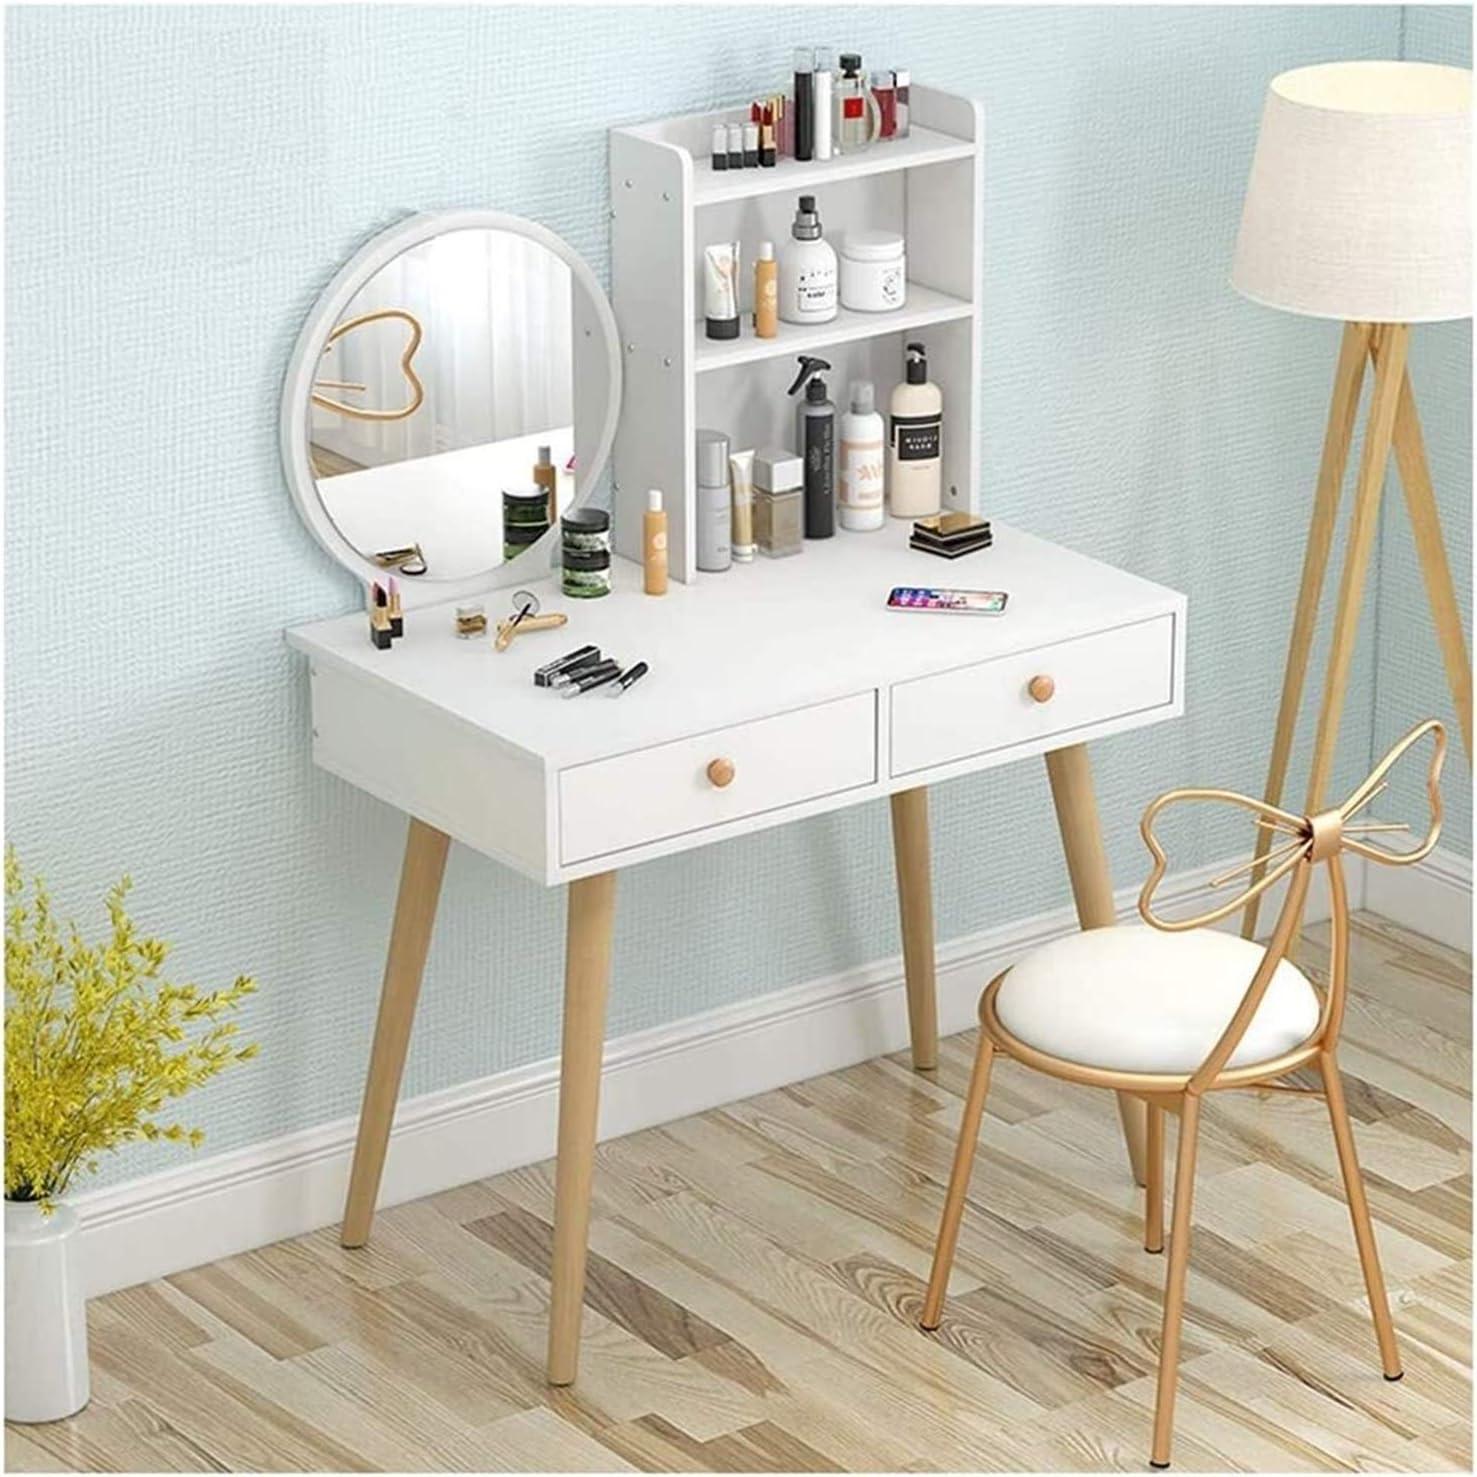 Cheap SALE Start LXYLXY Makeup Organizer Vanity Table Set Dressing 5 popular